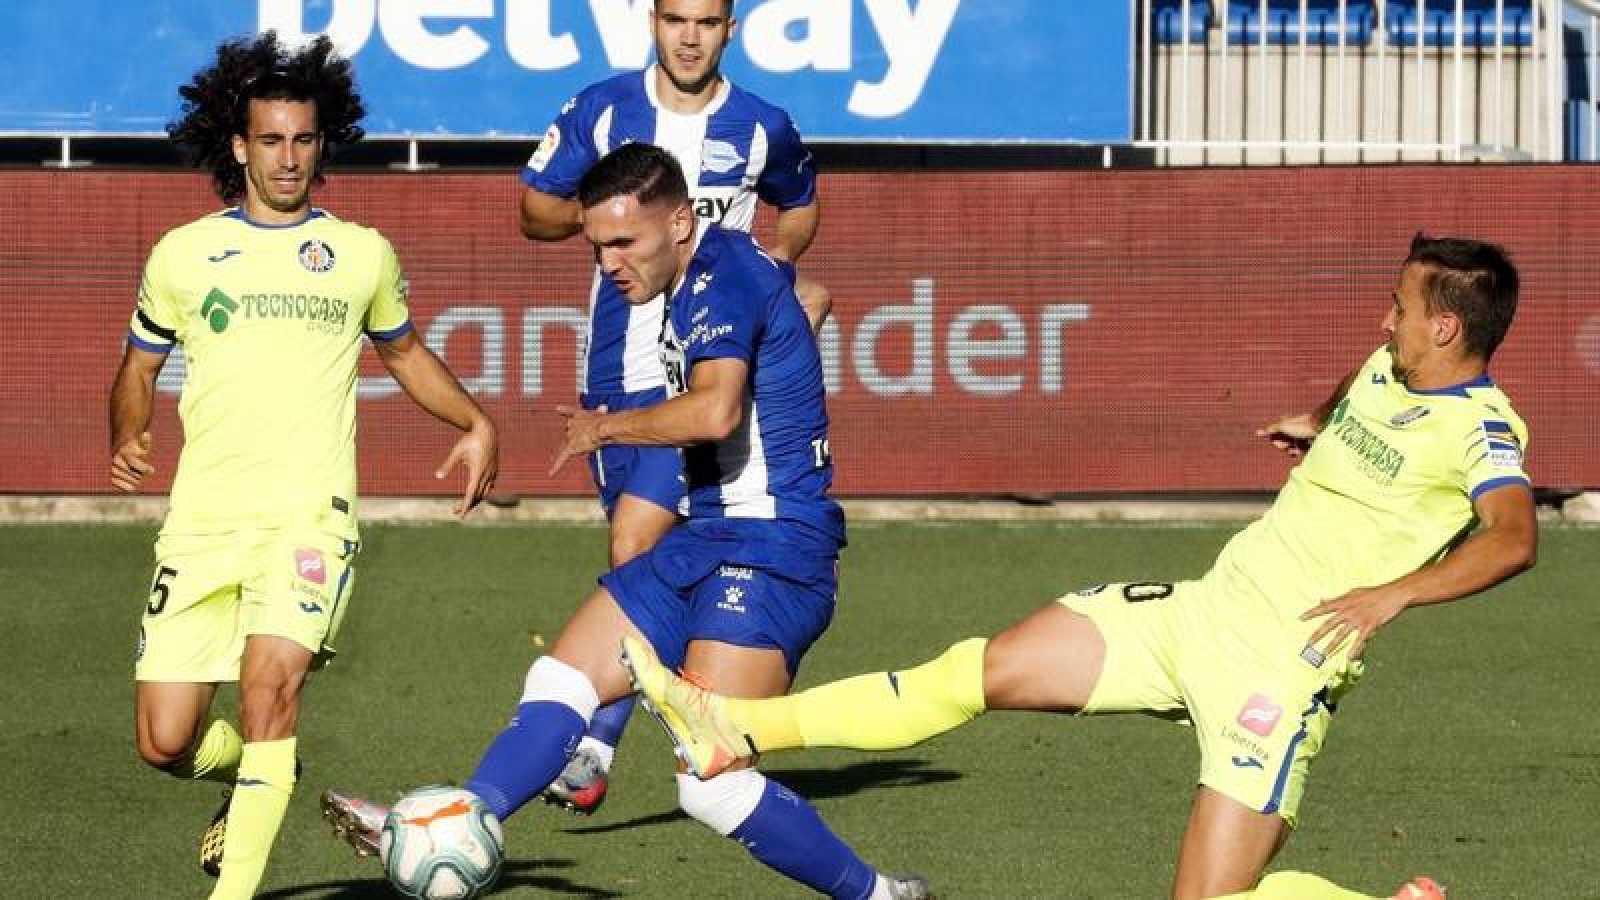 Lucas Pérez trata de disparar ante la defensa del getafense Maksimovic.